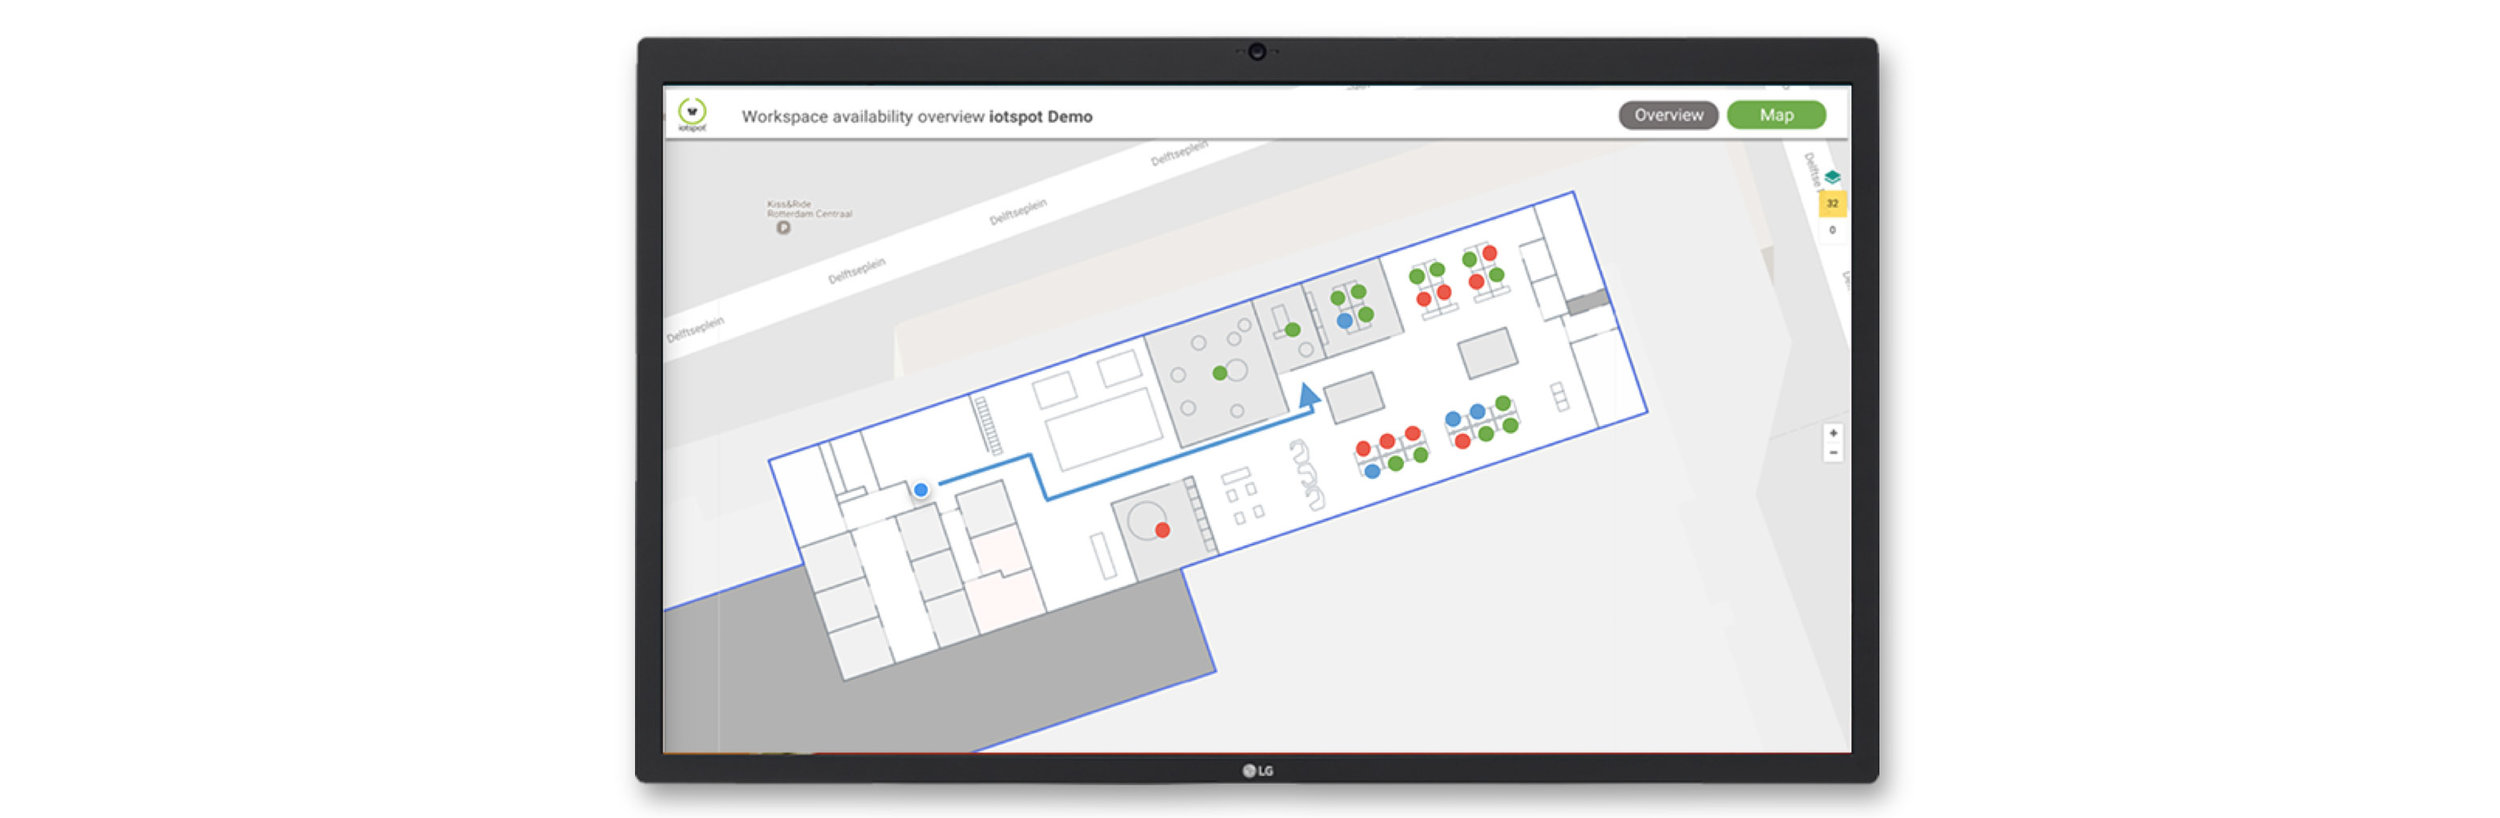 iotspot Google indoor lobby screen.jpg